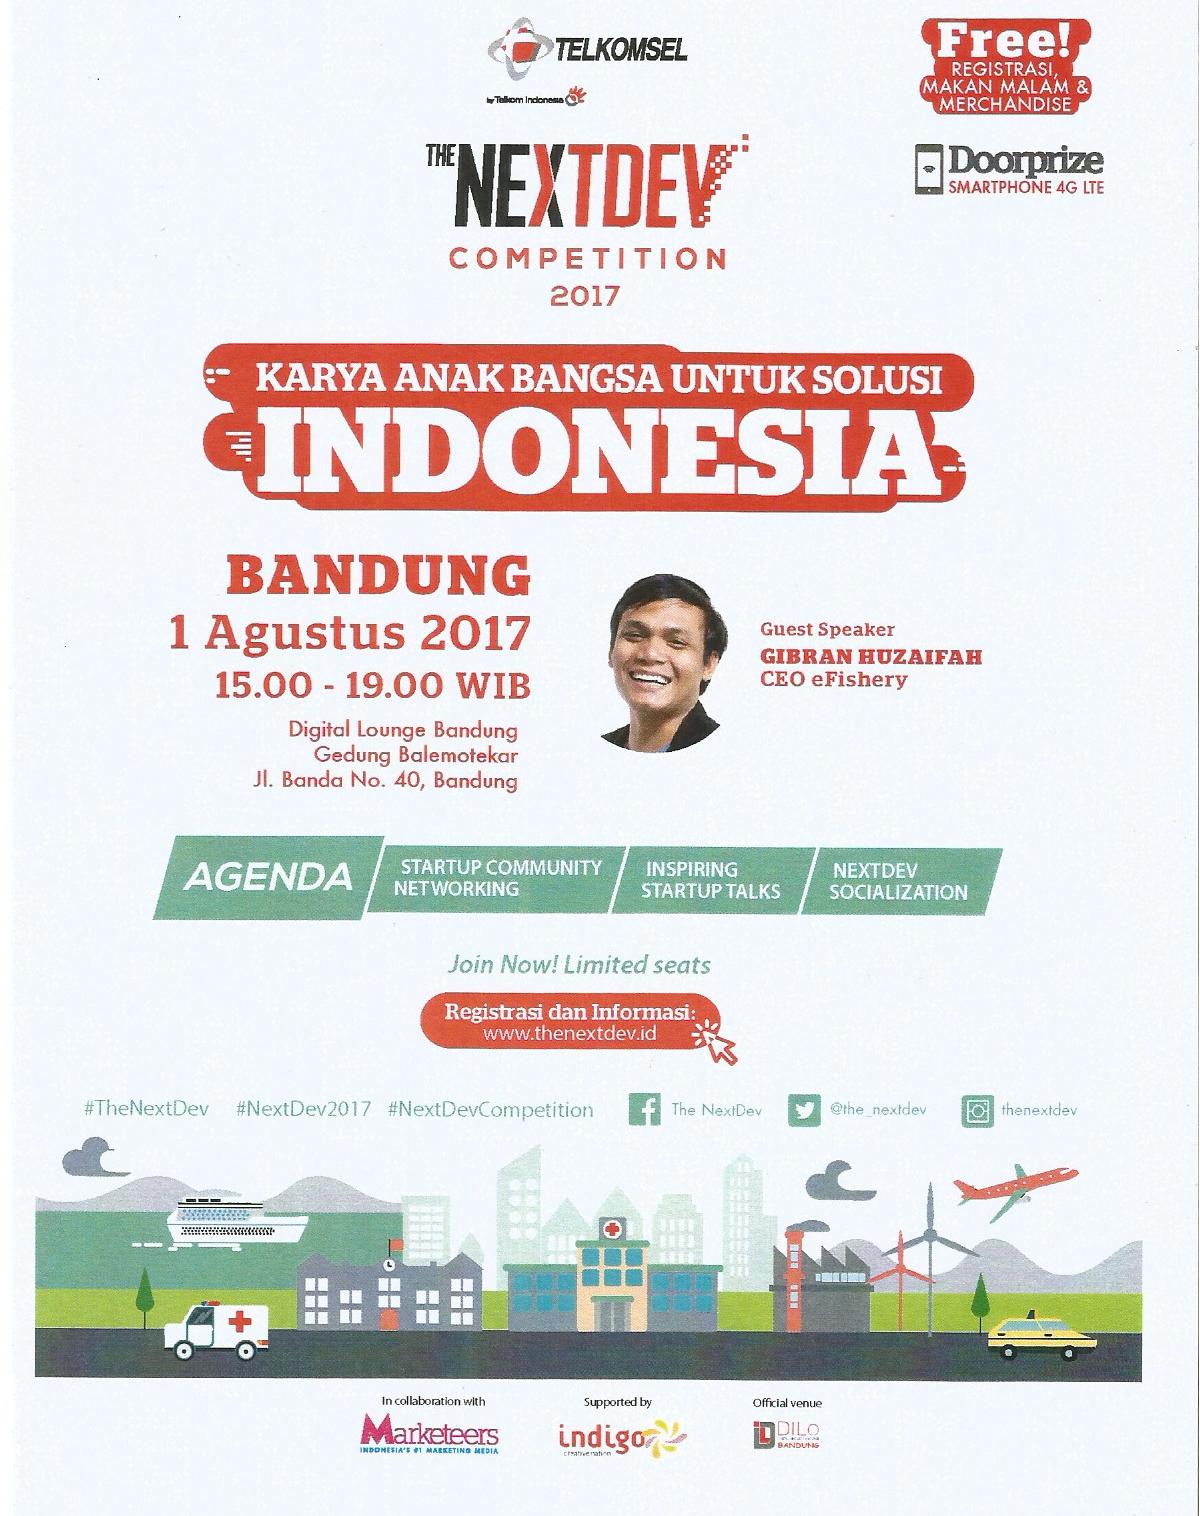 Sosialisasi The NextDev Competition 2017